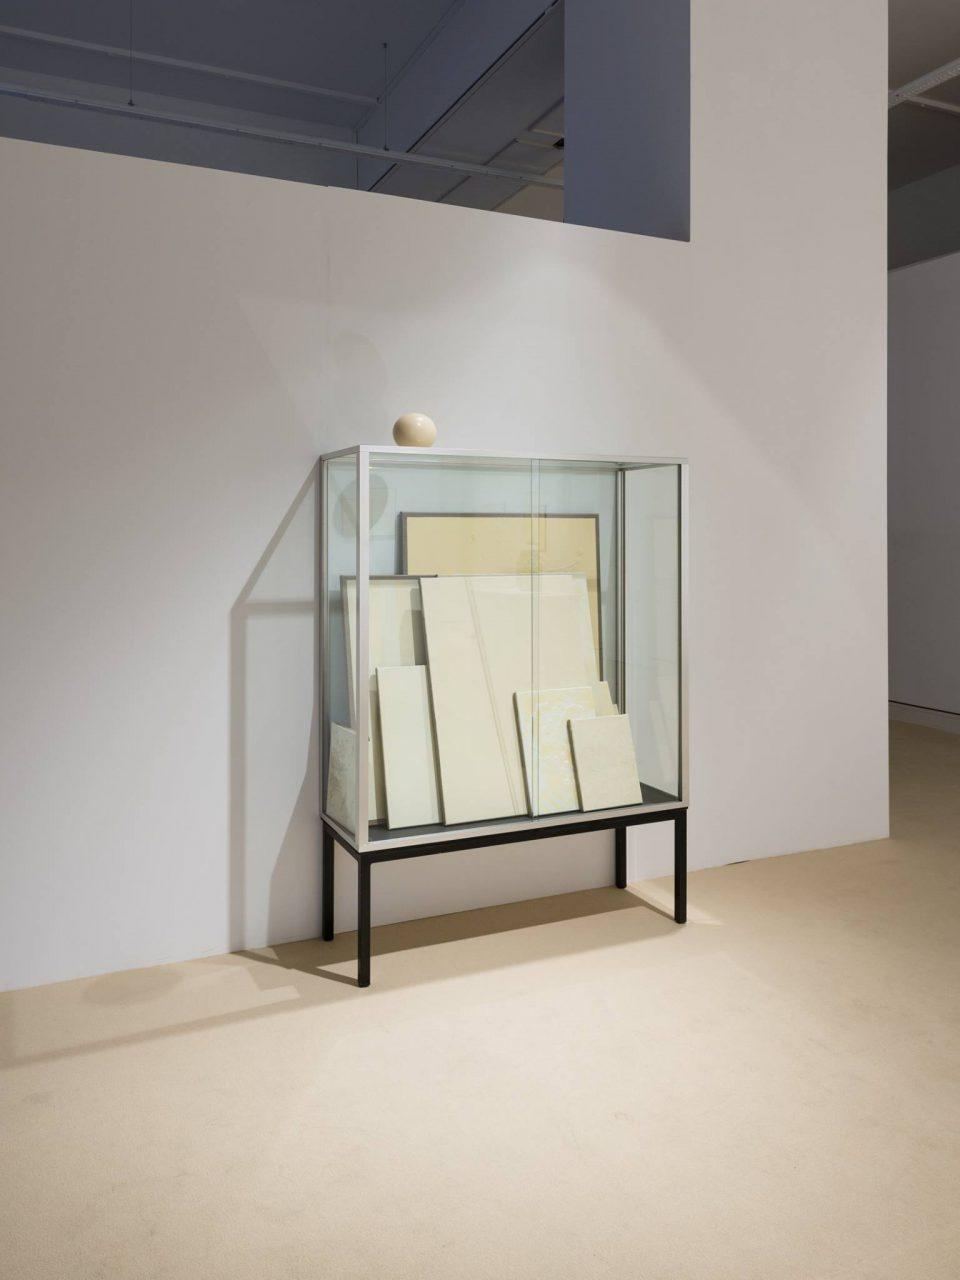 Cosmic Latte | Galerie im Turm (2016) Foto: Trevor Good